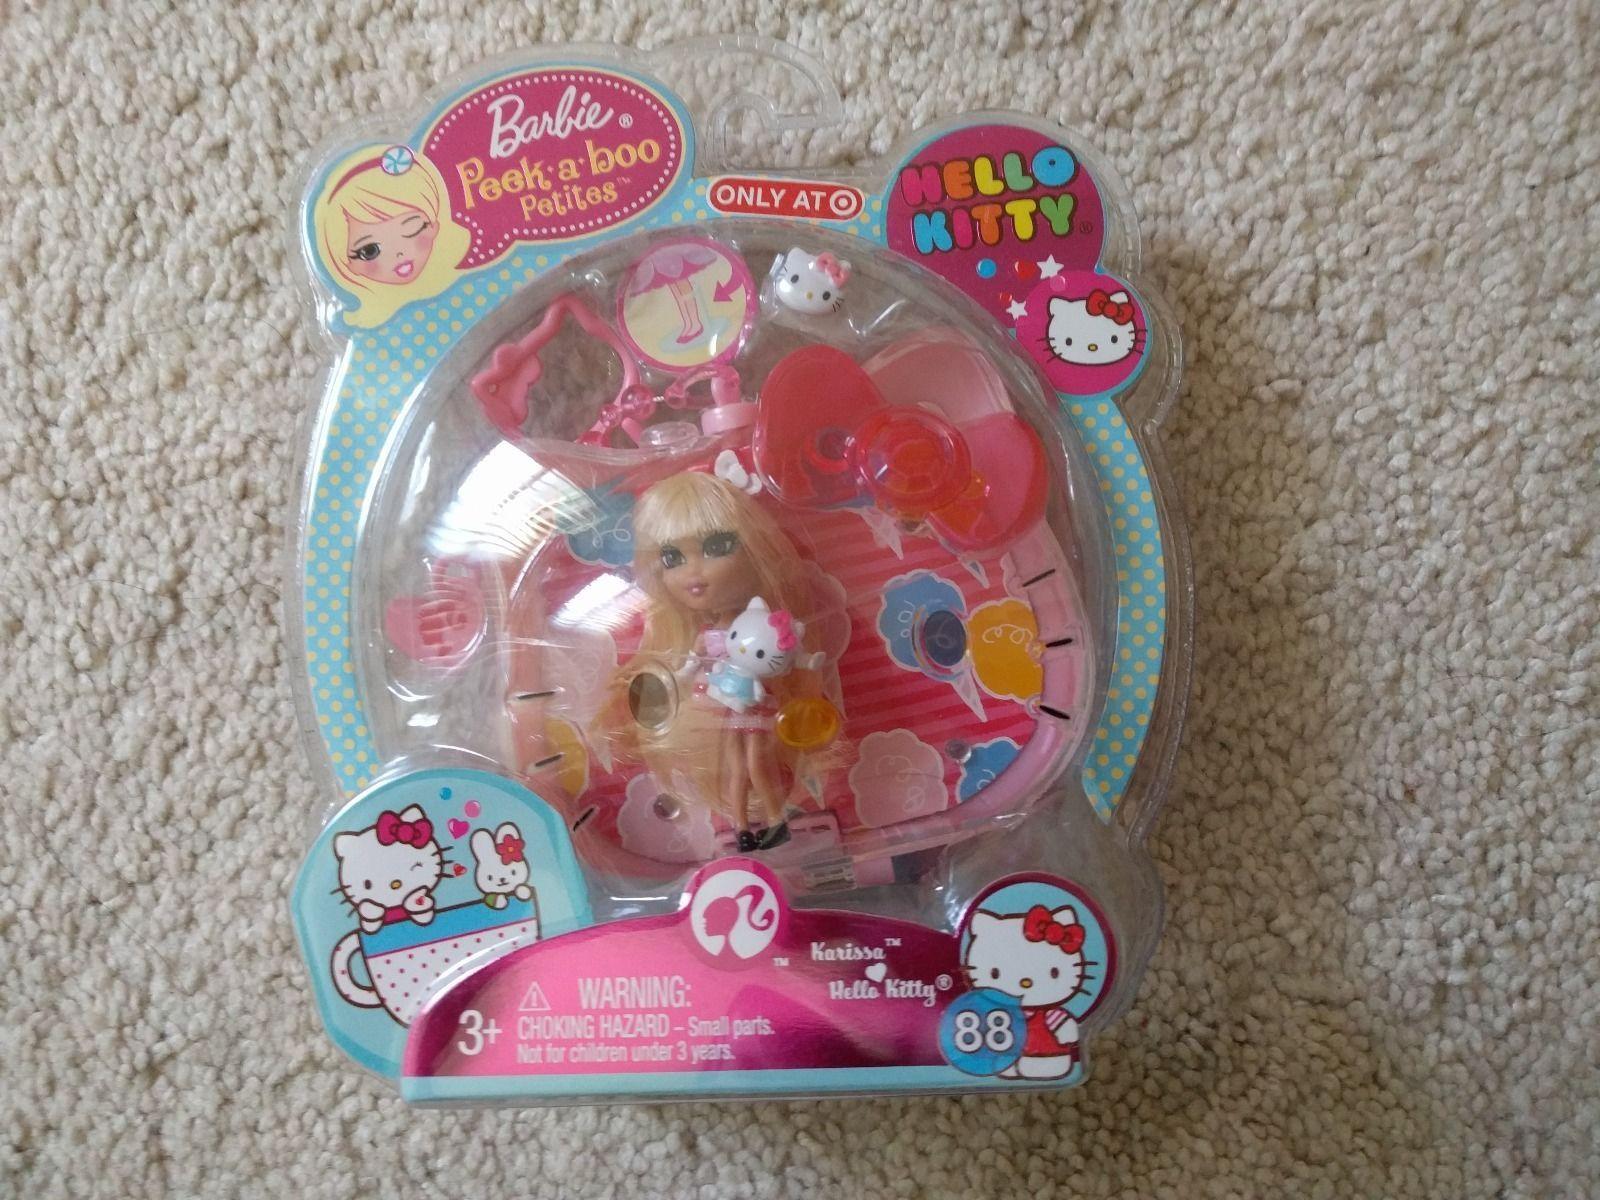 Barbie Peek A Boo Petites Hello Kitty Karissa 88 Ebay Dolls